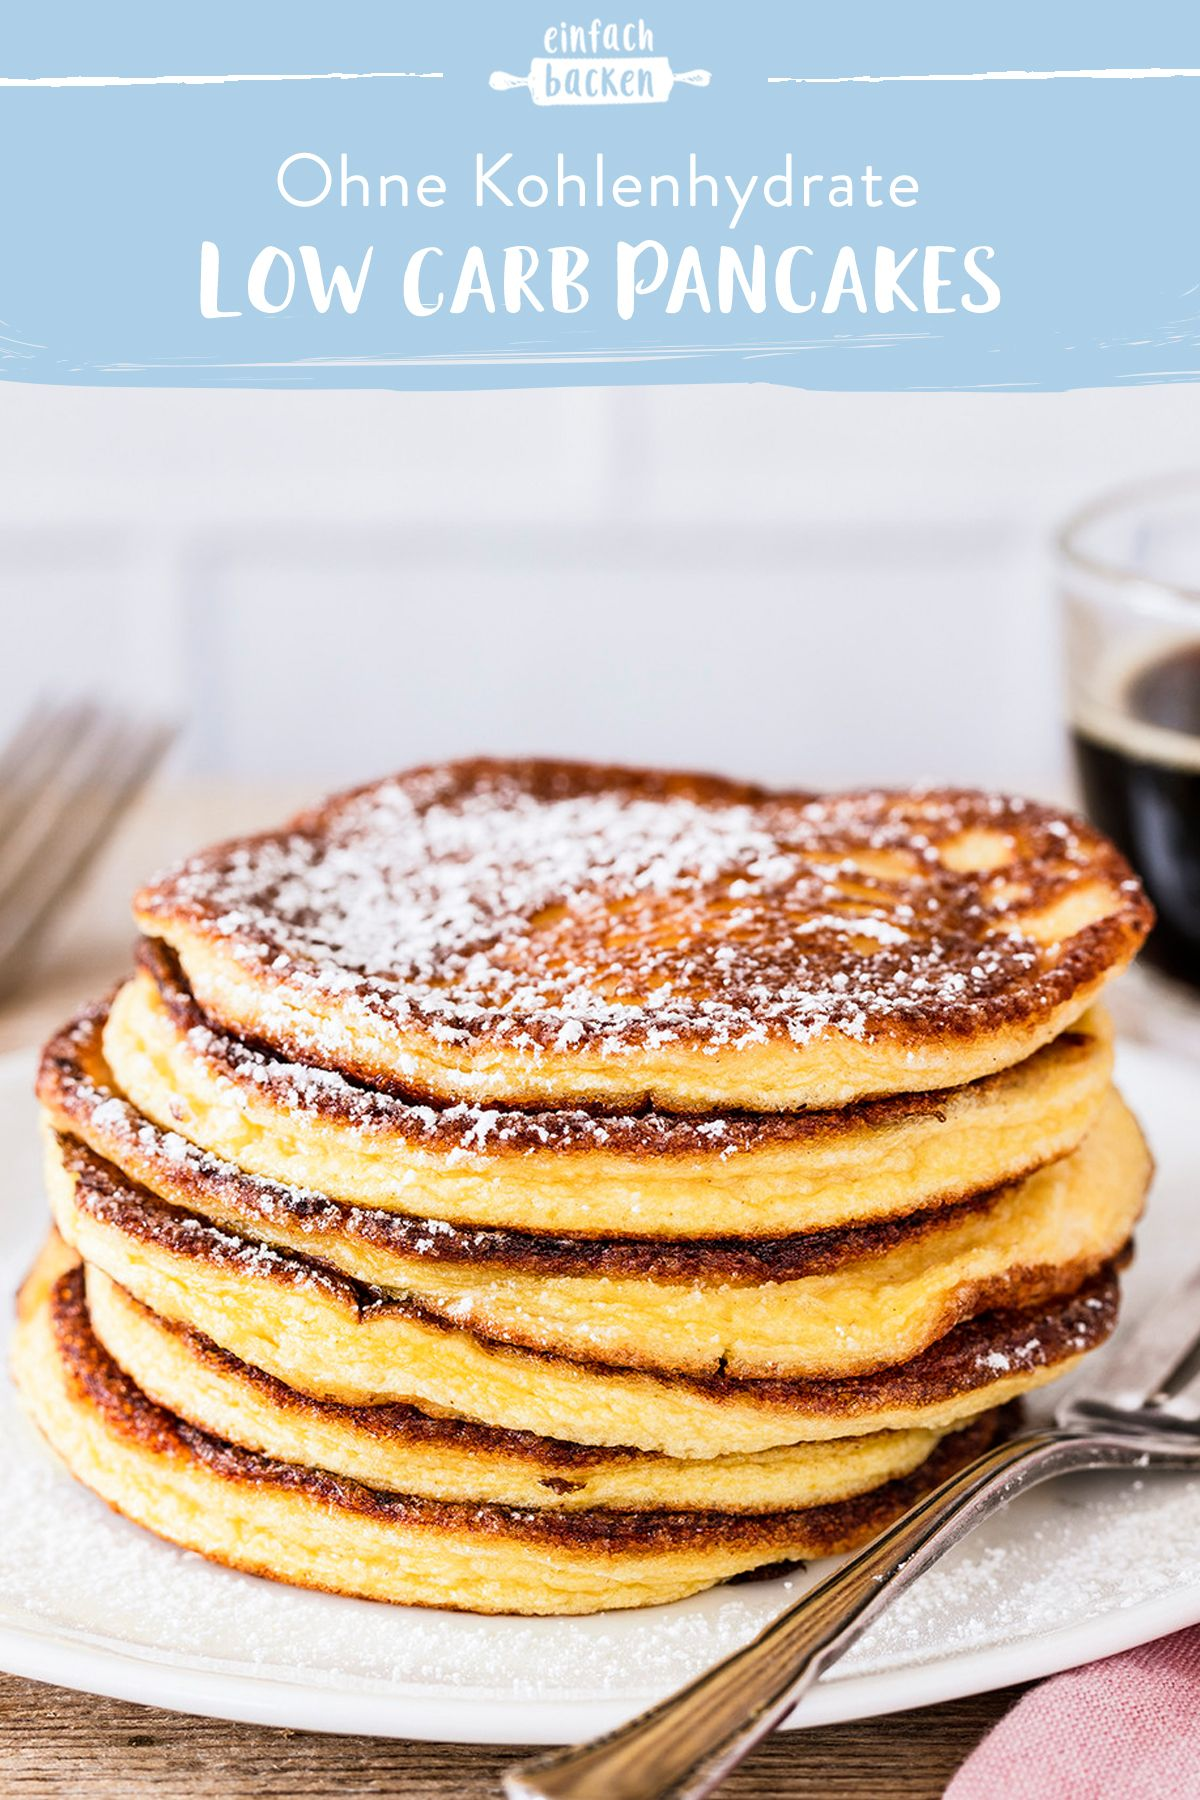 Low Carb Pancakes #lowcarbdesserts